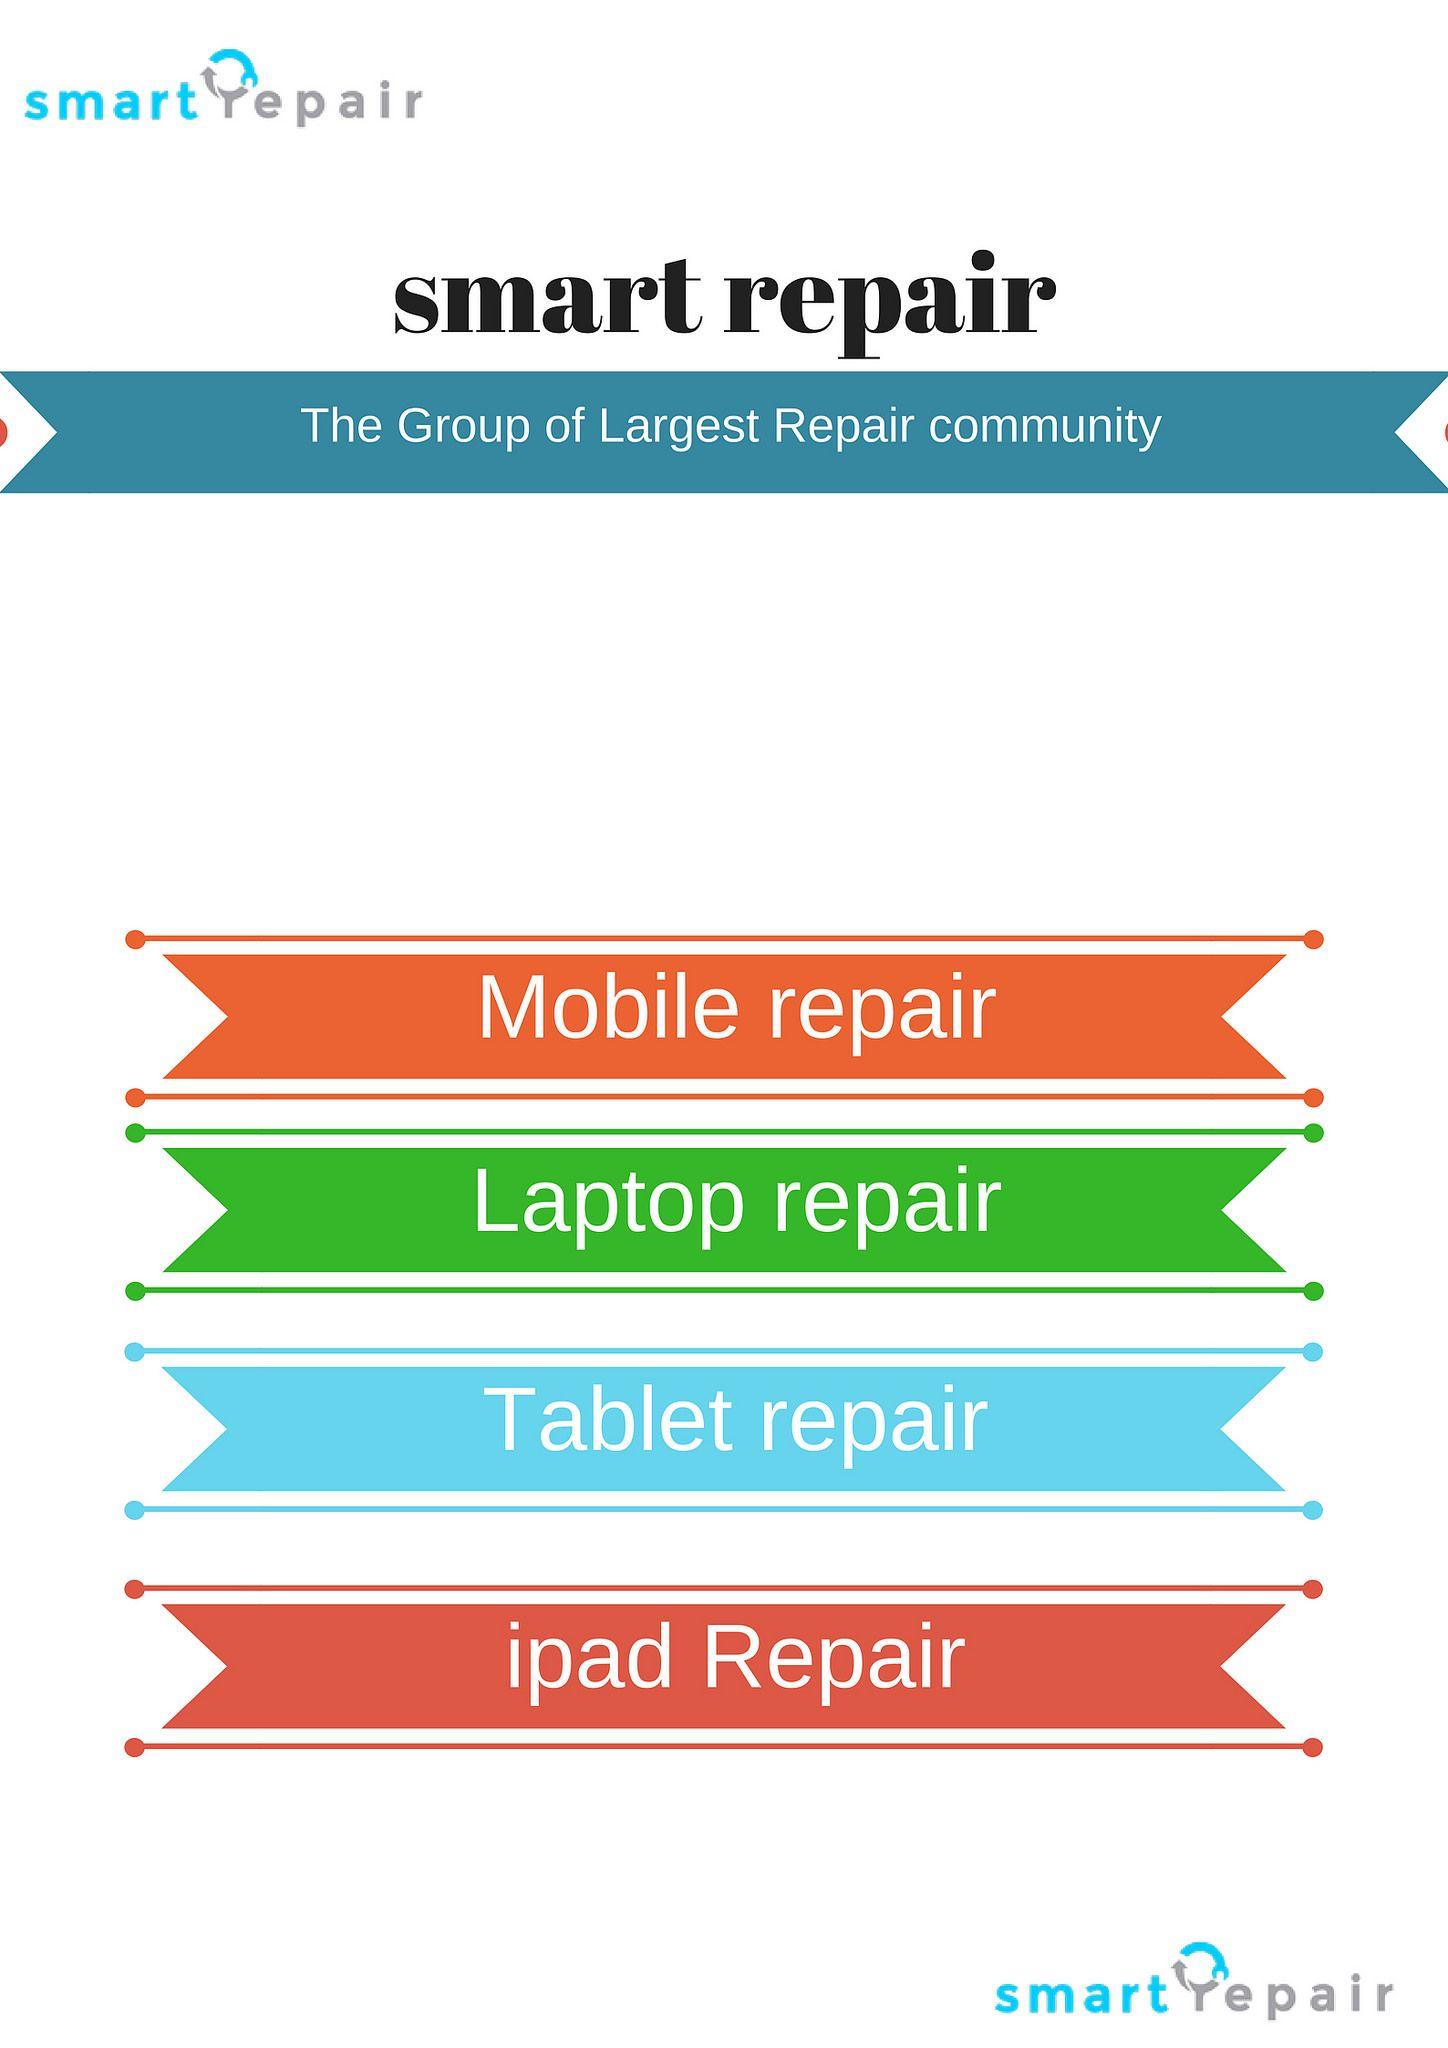 smart repair Communication plan template